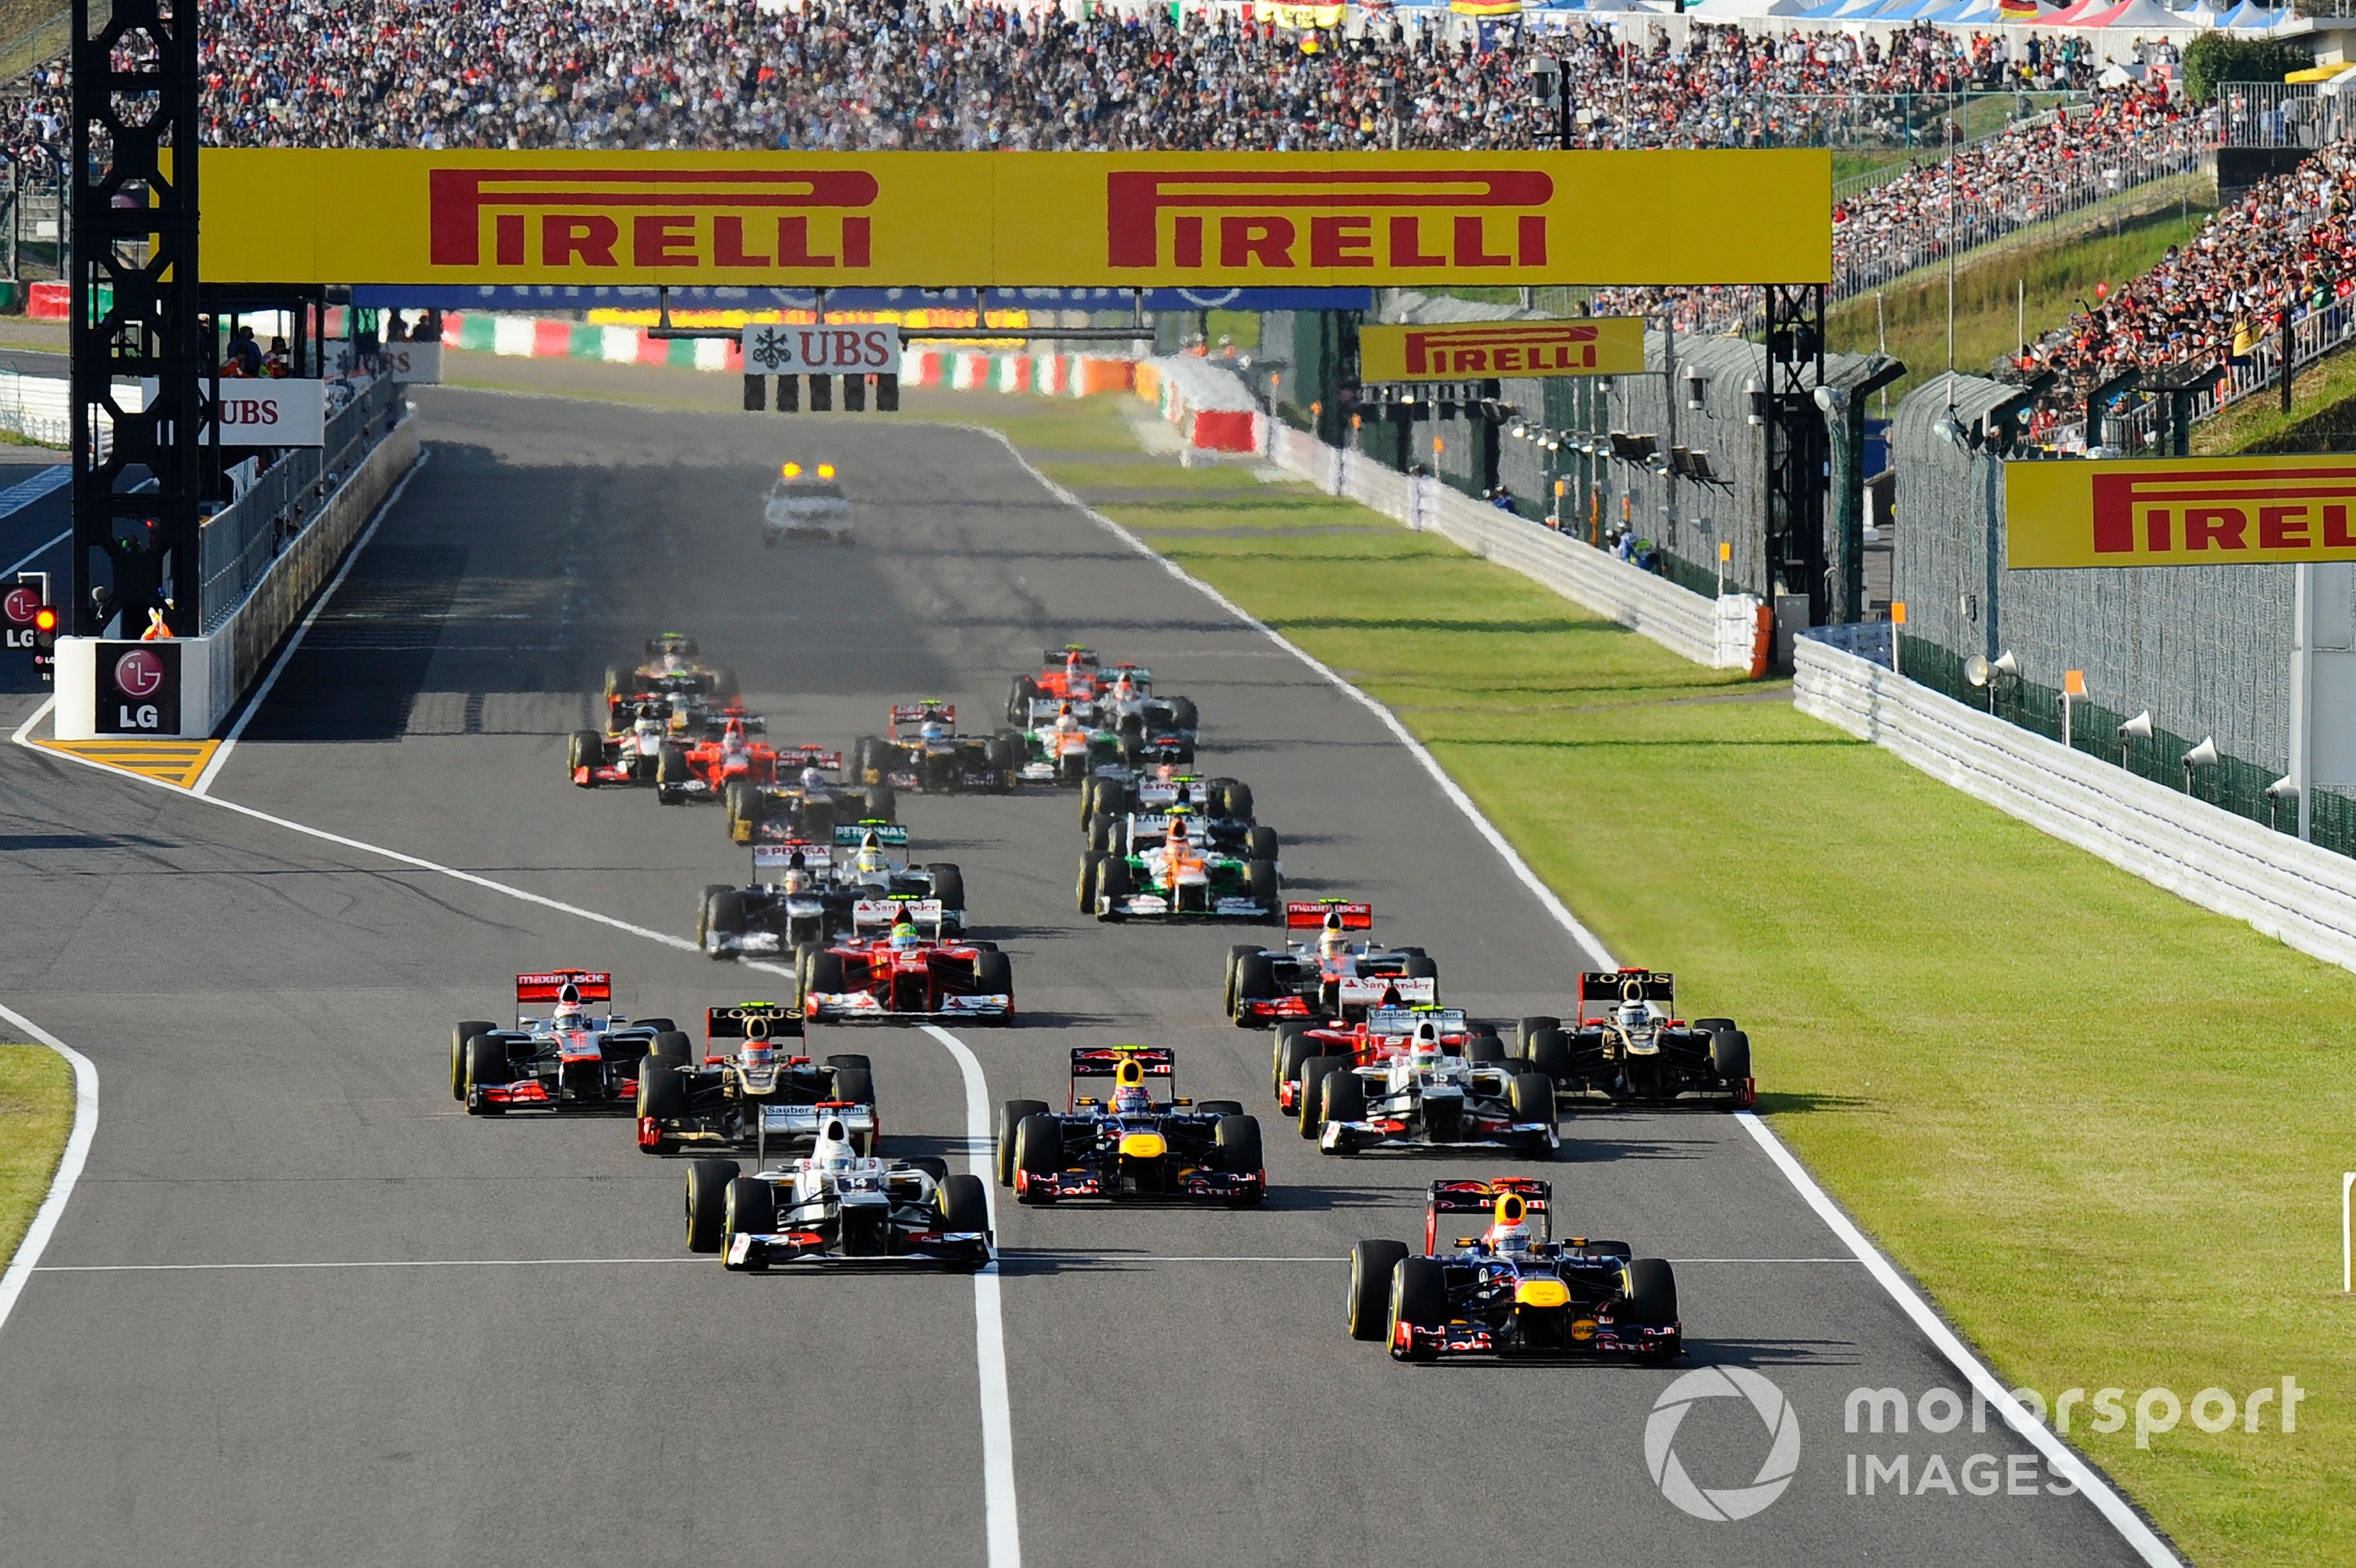 Sebastian Vettel, Red Bull Racing RB8, leads at the start of the race at the 2012 Japanese GP